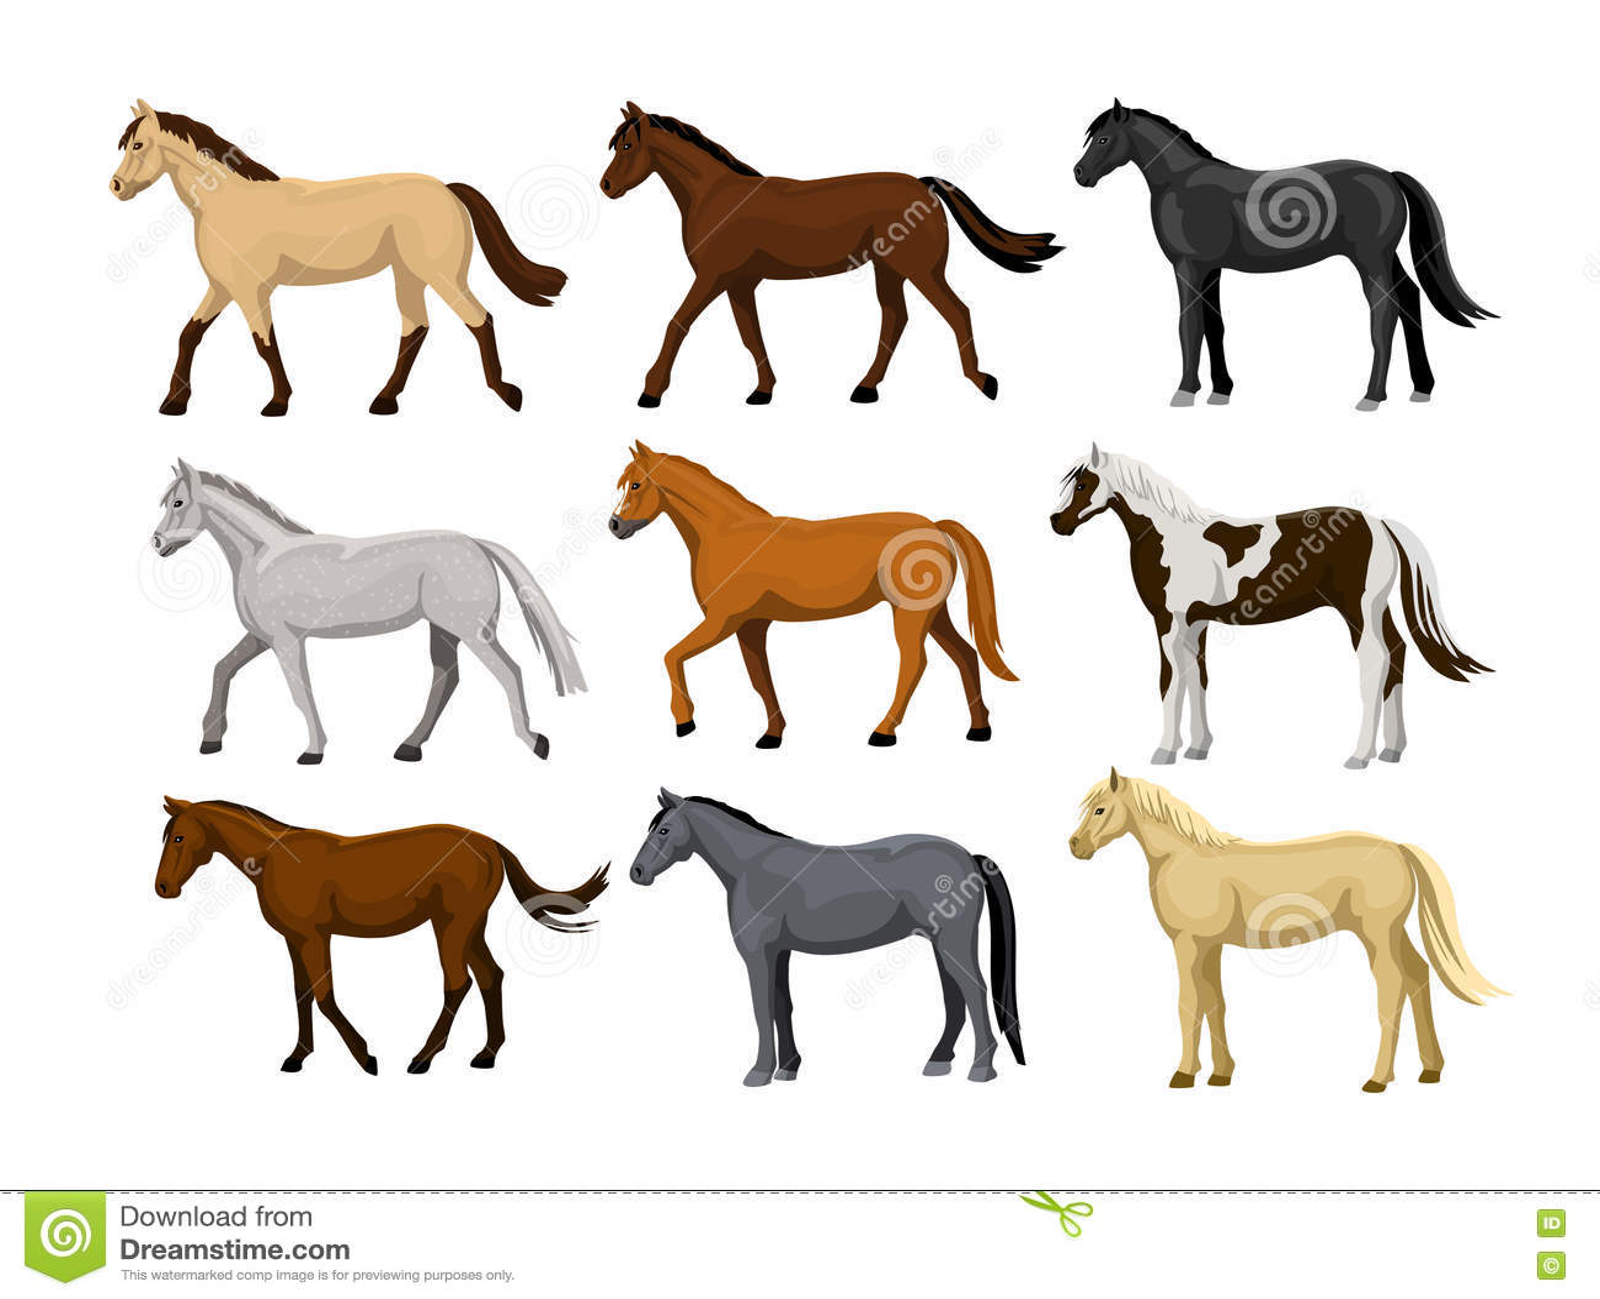 Different Horses Set In Typical Coat Colors Black Chestnut Dapple Grey Dun Bay Cream Buckskin Palomino Tobiano Paint Pa Stock Vector Illustration Of Head Dapple 78863868